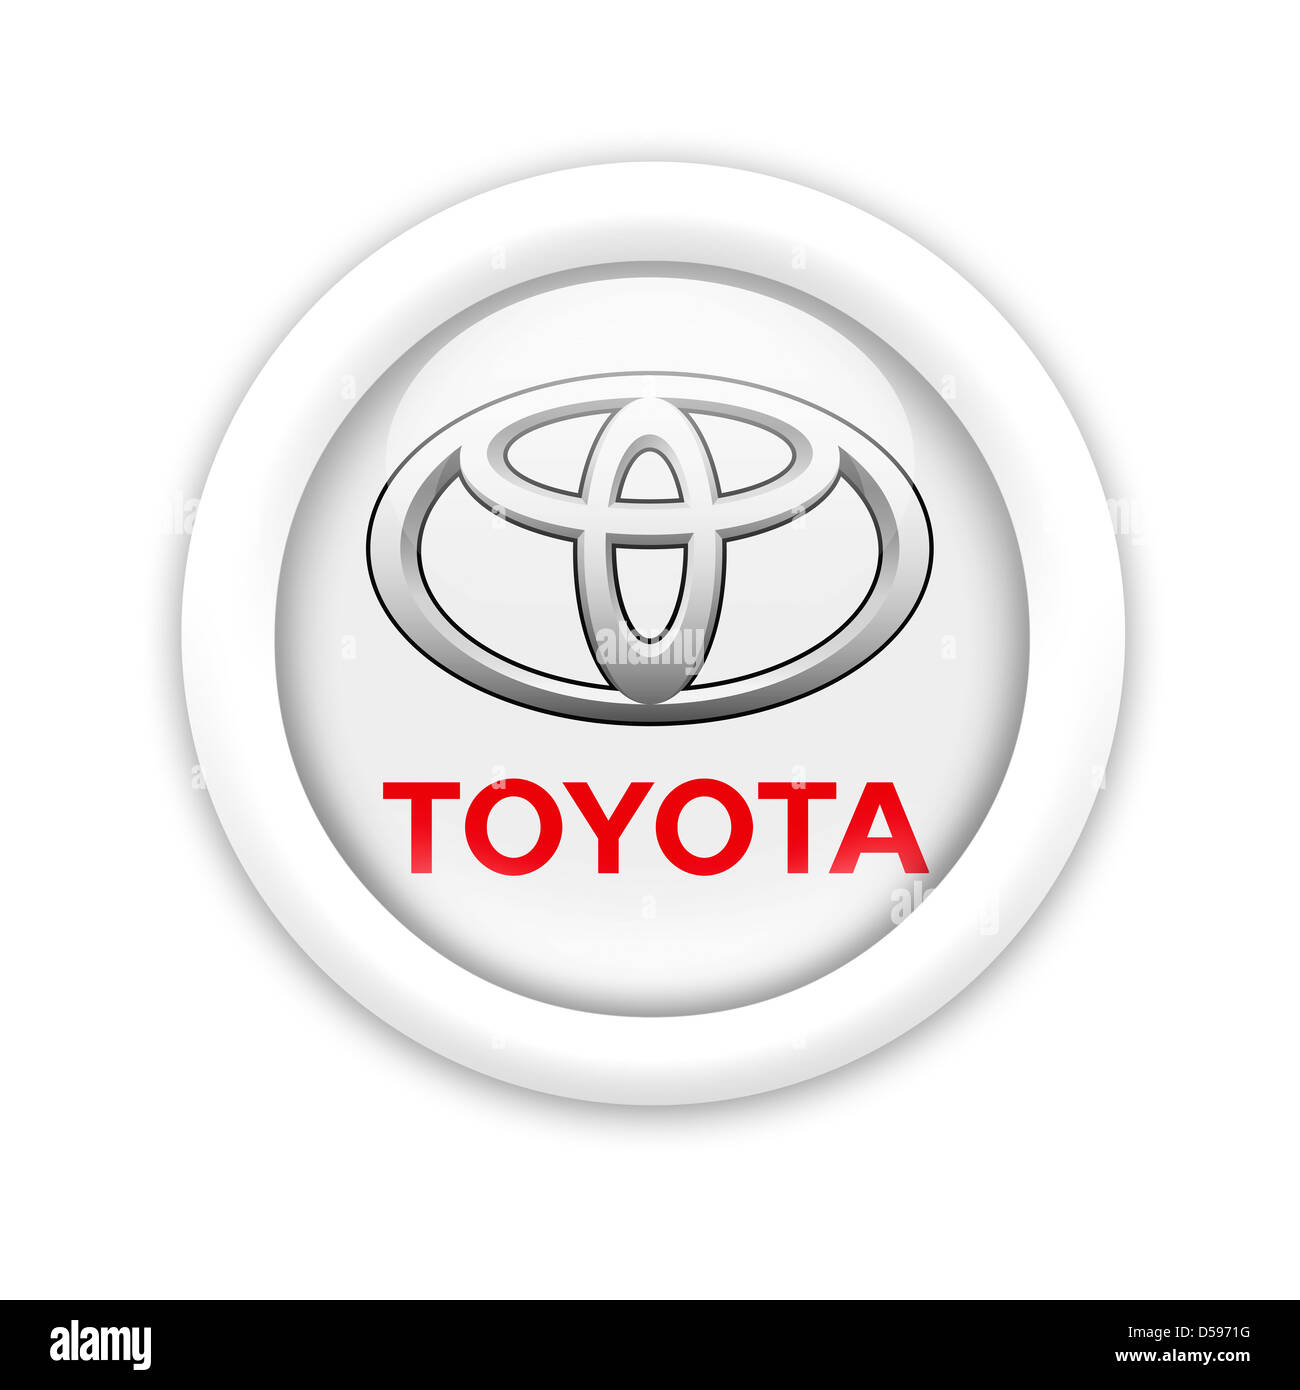 Toyota Symbol Stock Photos Toyota Symbol Stock Images Page 2 Alamy